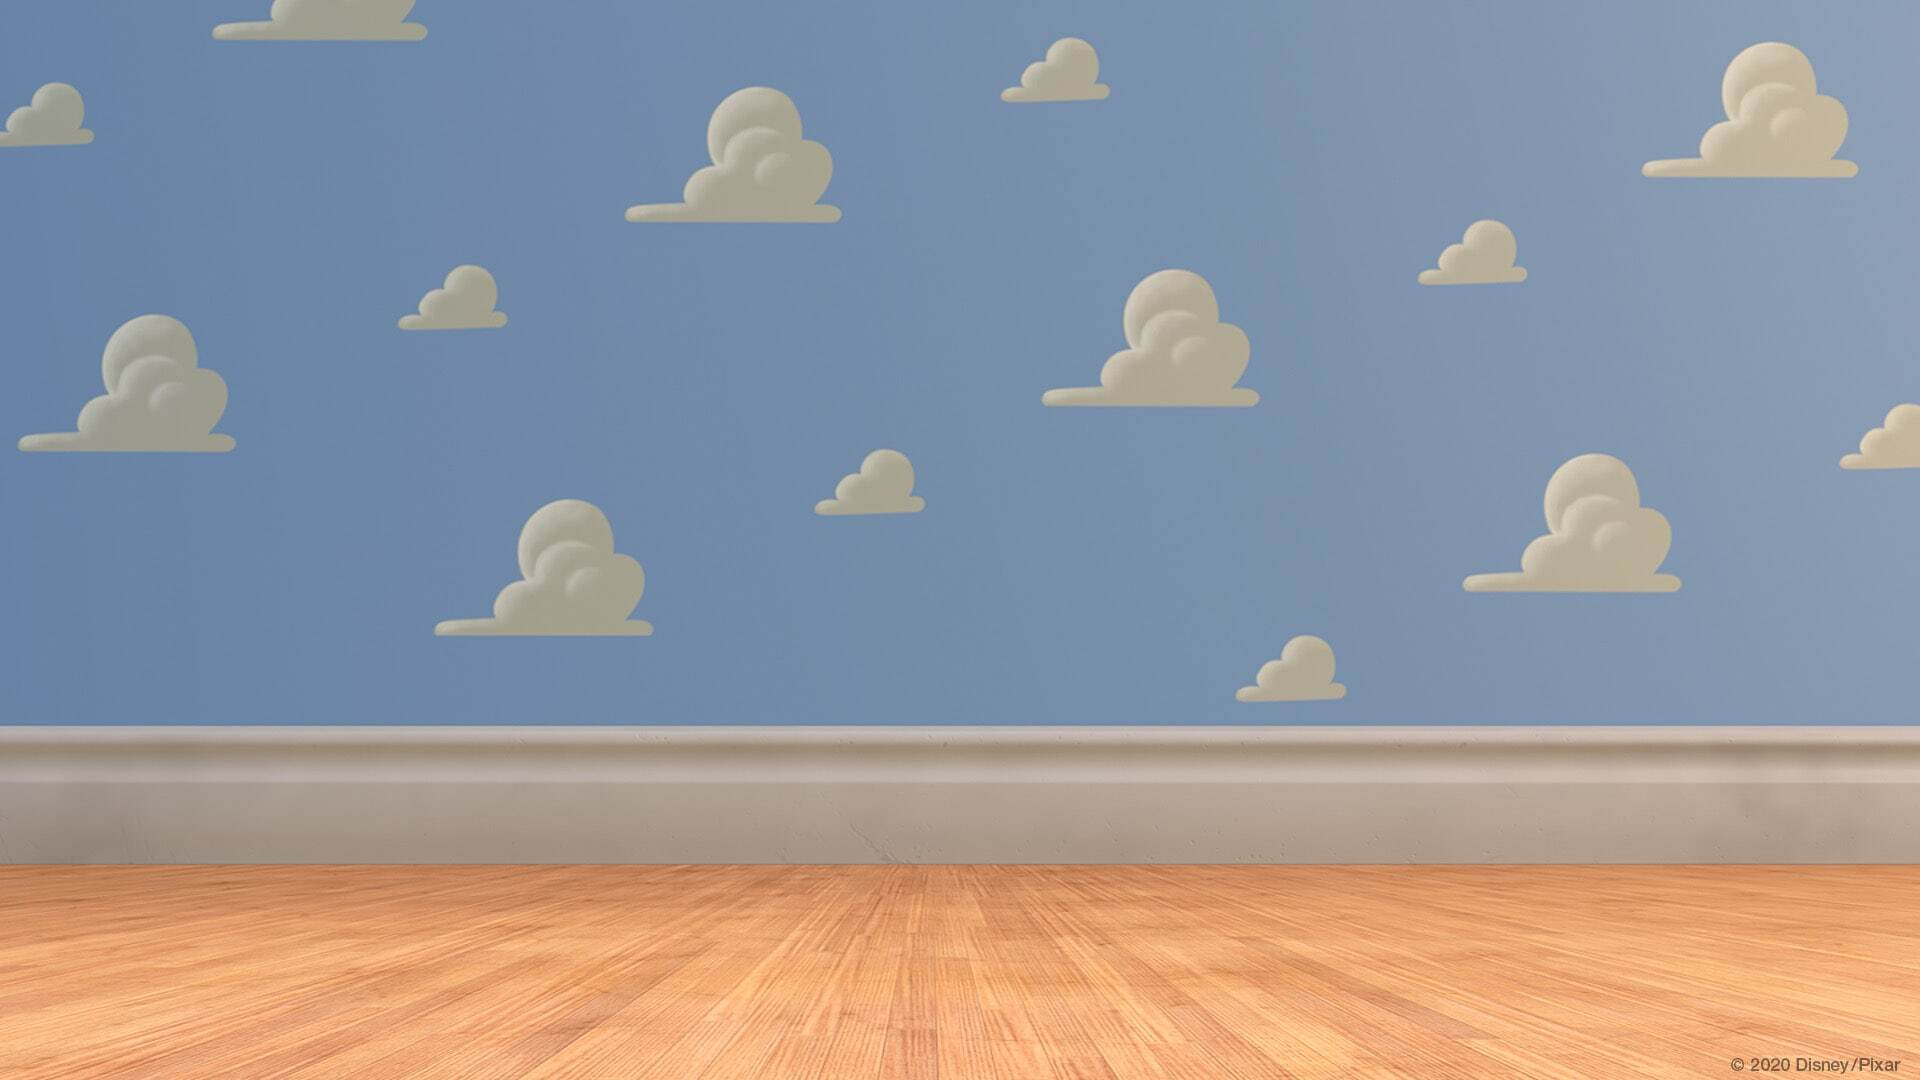 Grab These Free Pixar Desktop Wallpapers